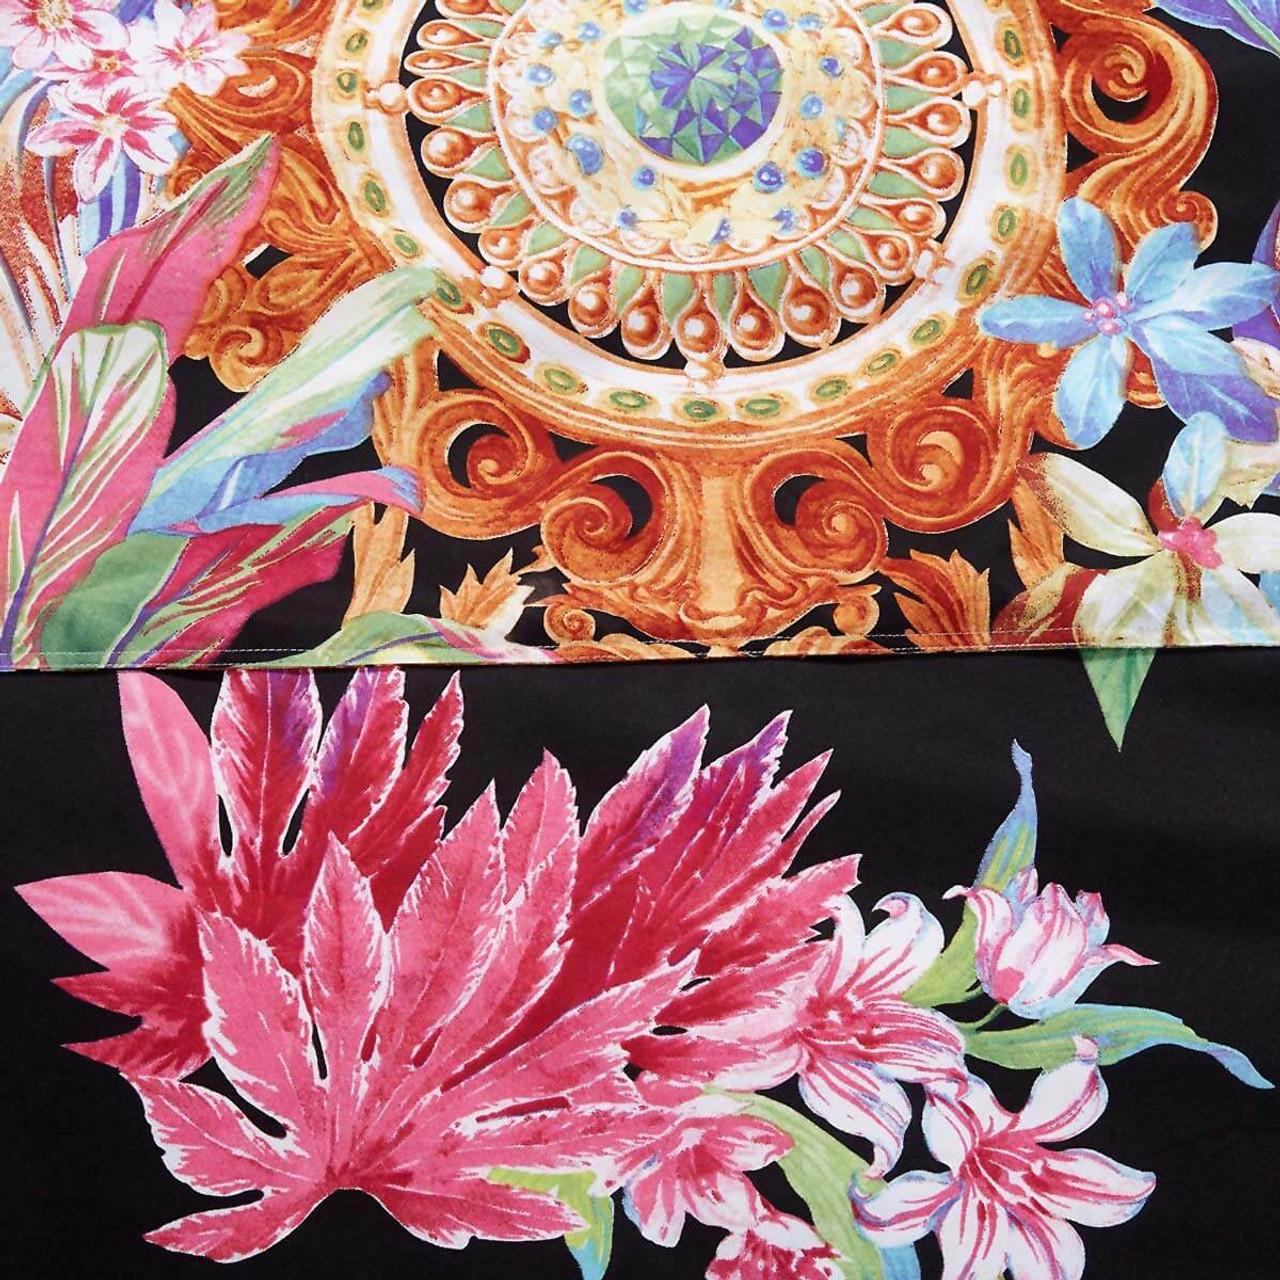 Floral Bedding Sets Wholesale-Dropship DM712K